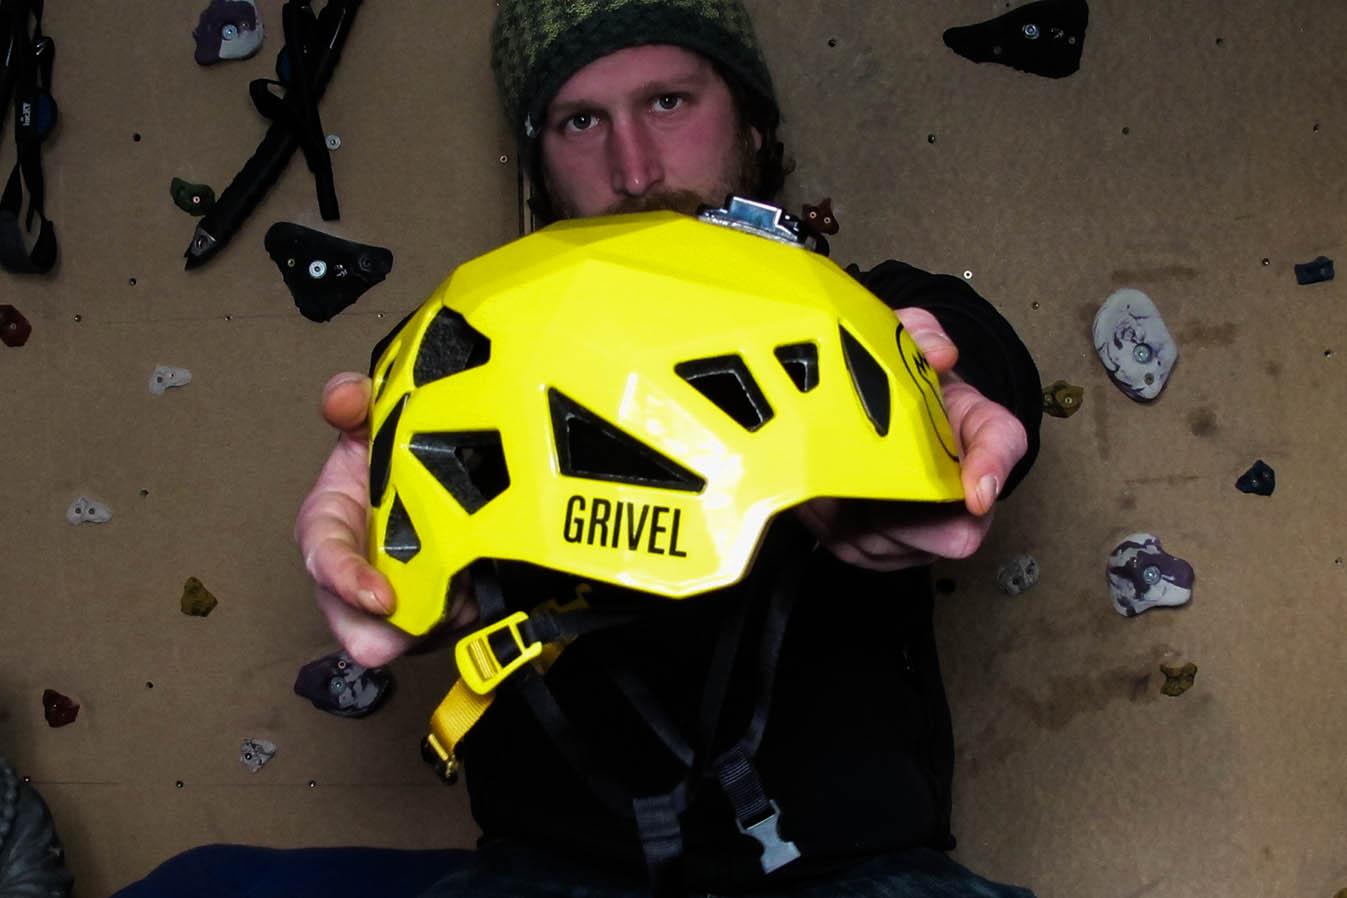 [:de]Grivel Stealth Ultraleicht Kletterhelm [:en]Grivel Stealth Ultralight climbing helmet[:]